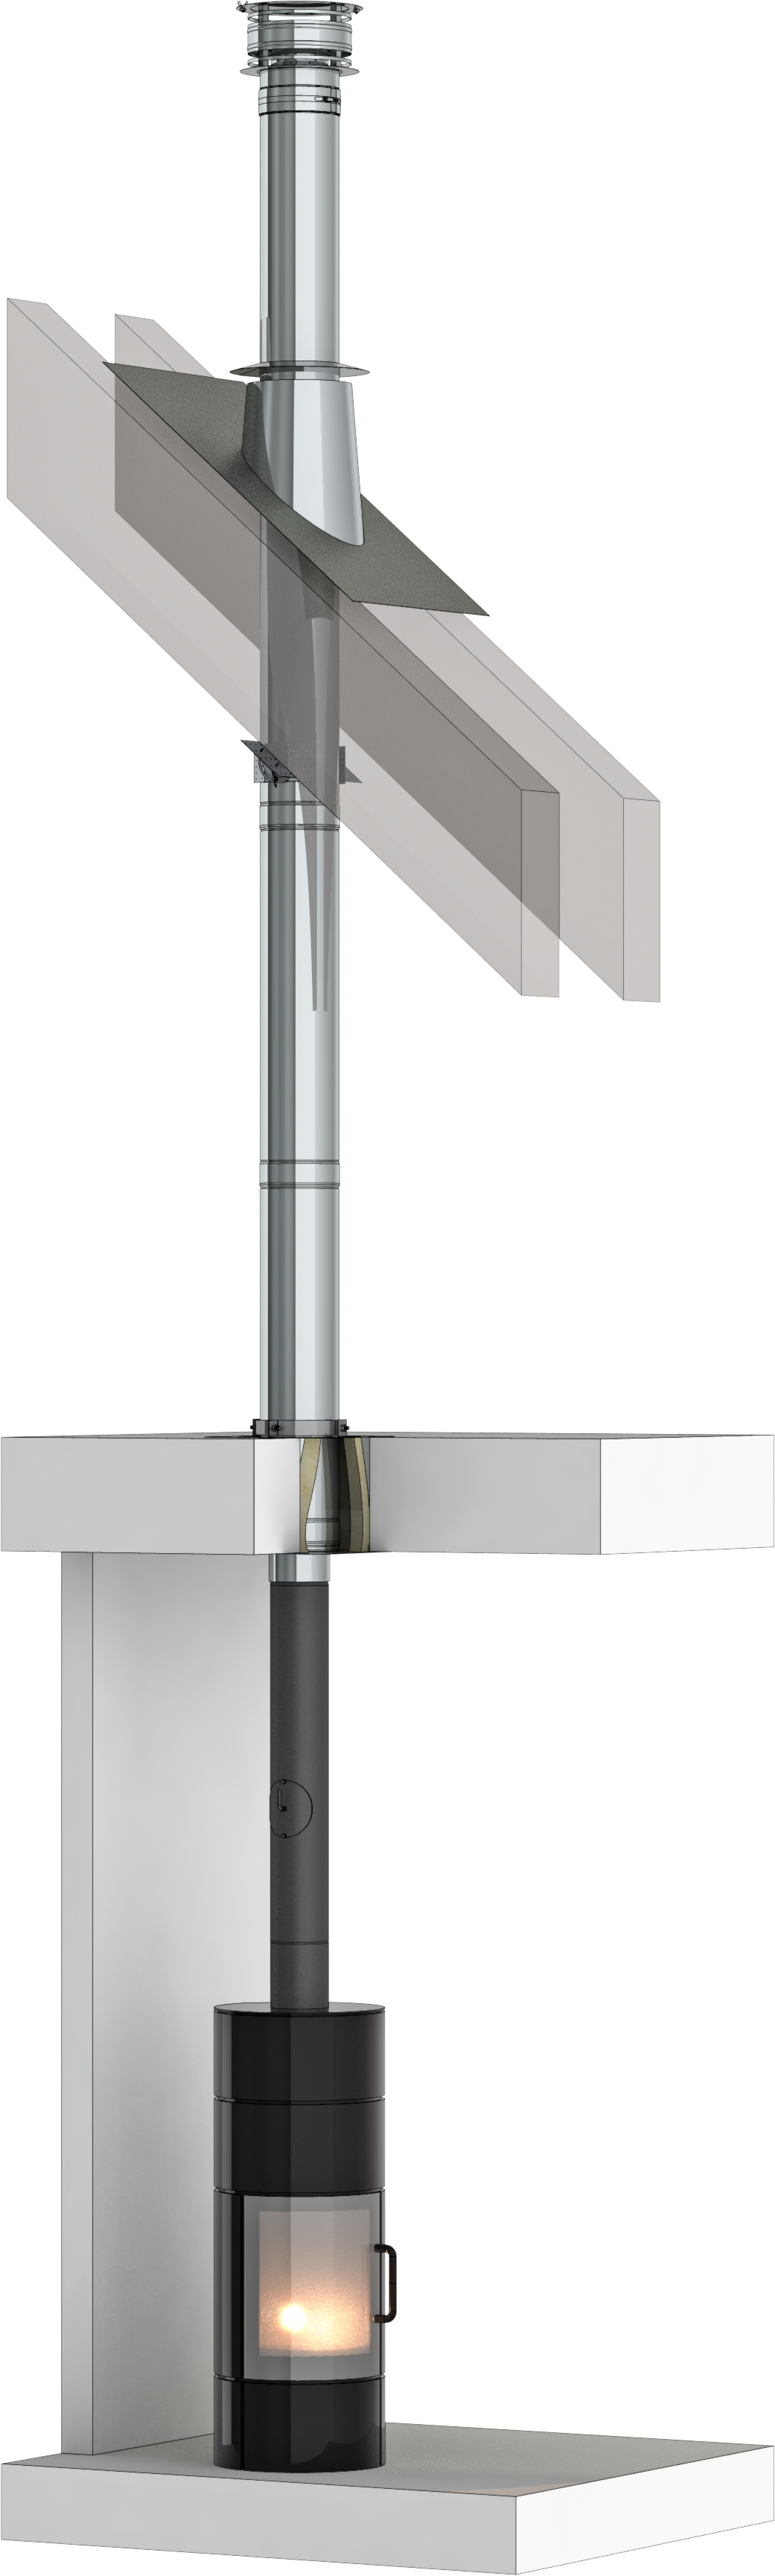 Dubbelwandig rookkanaal - TEC-DW-standaard  - bouwpakket voor binnenshuis - Ø150mm